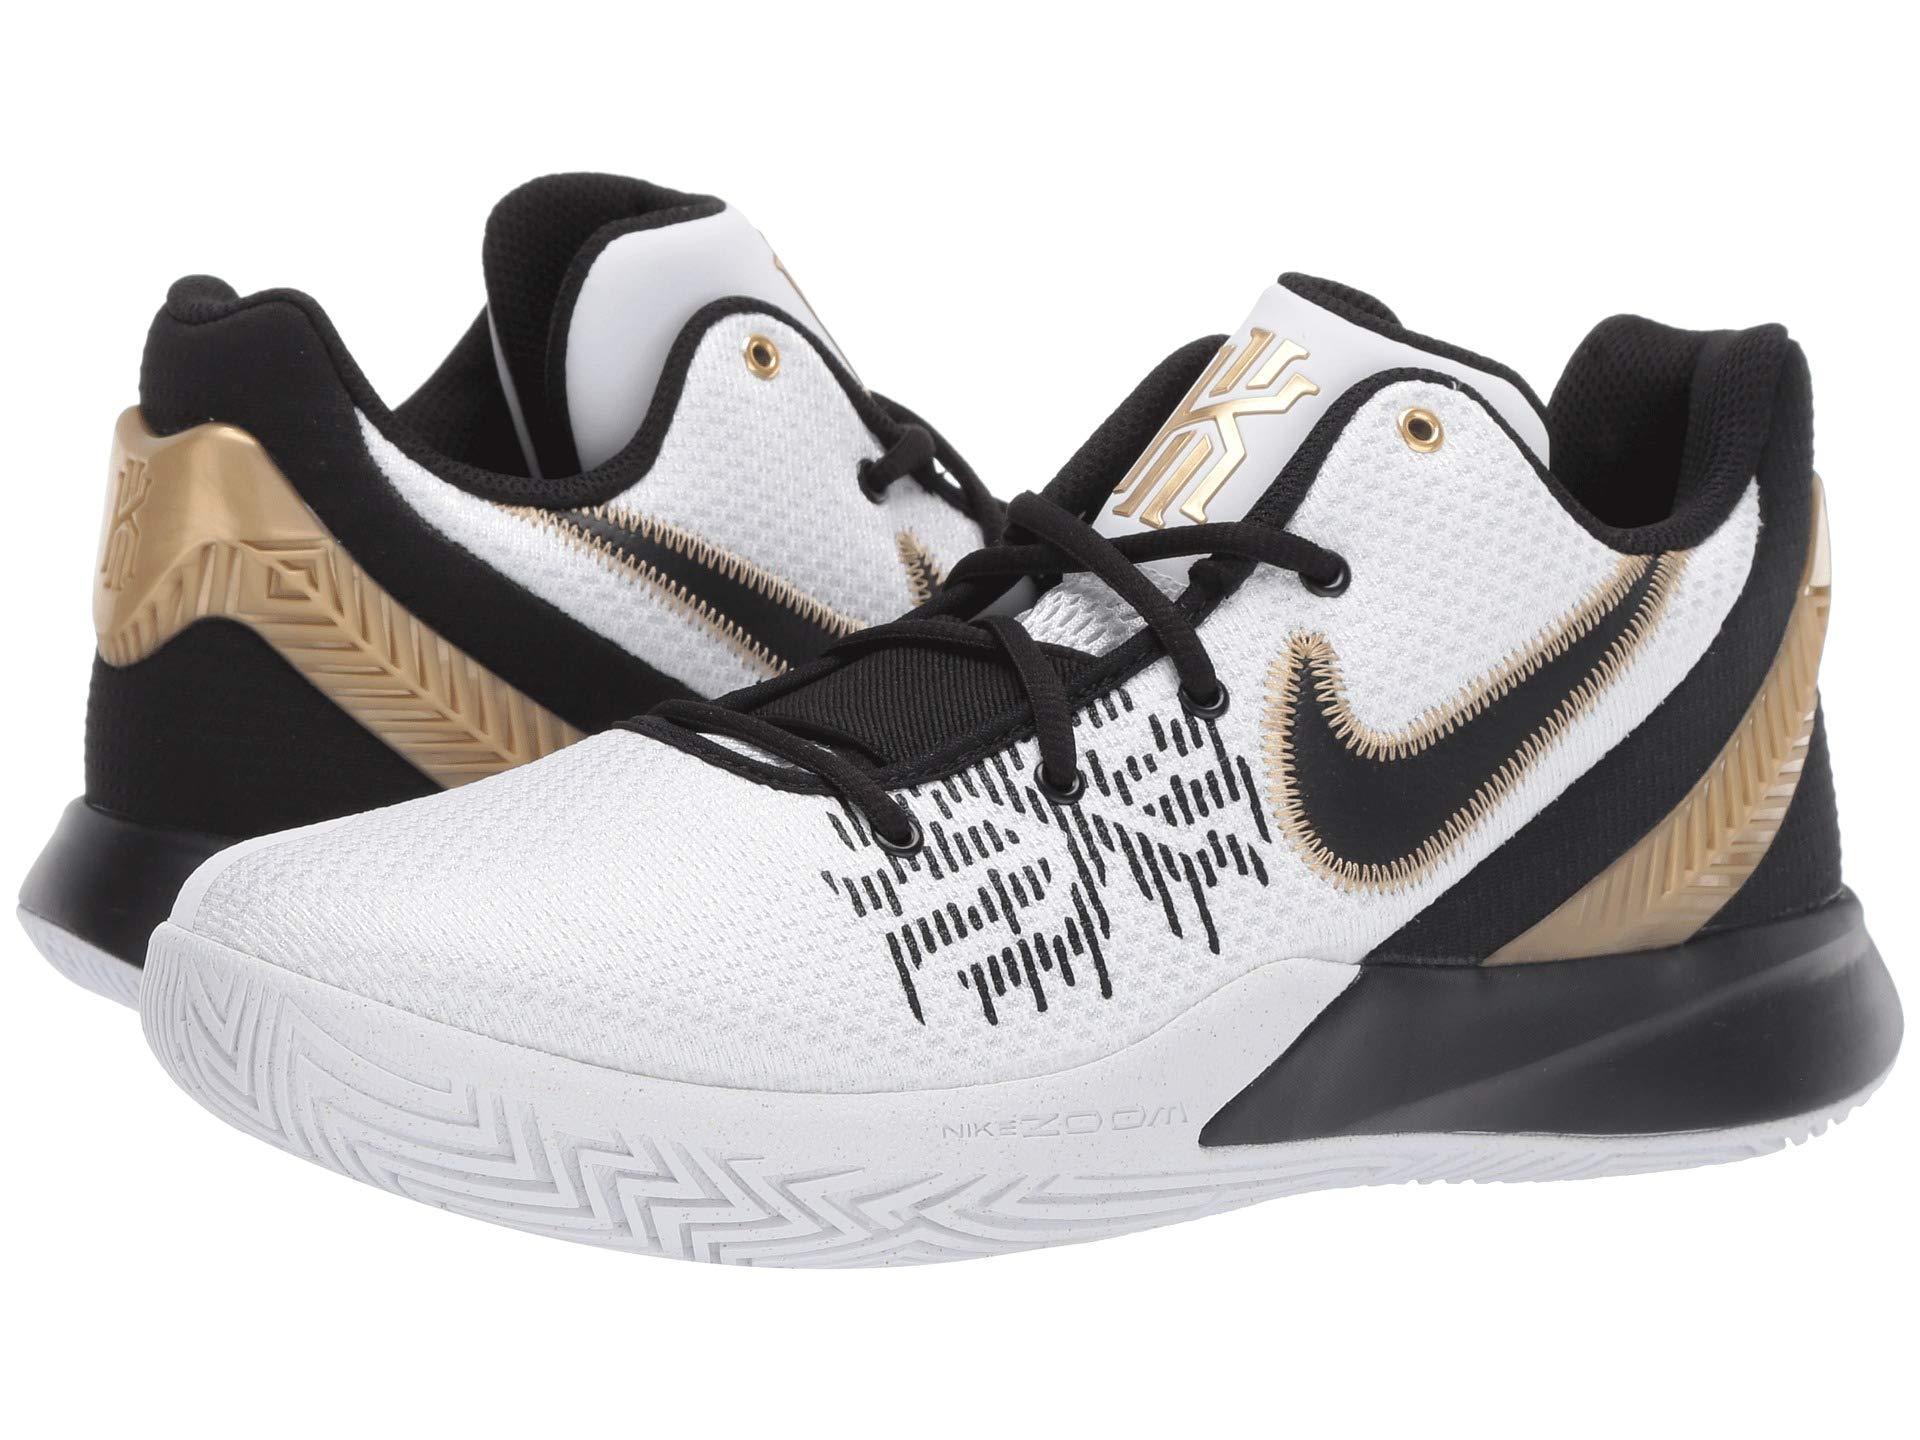 0e7d37cc6124 Nike - Kyrie Flytrap Ii (black black white) Men s Basketball Shoes for.  View fullscreen